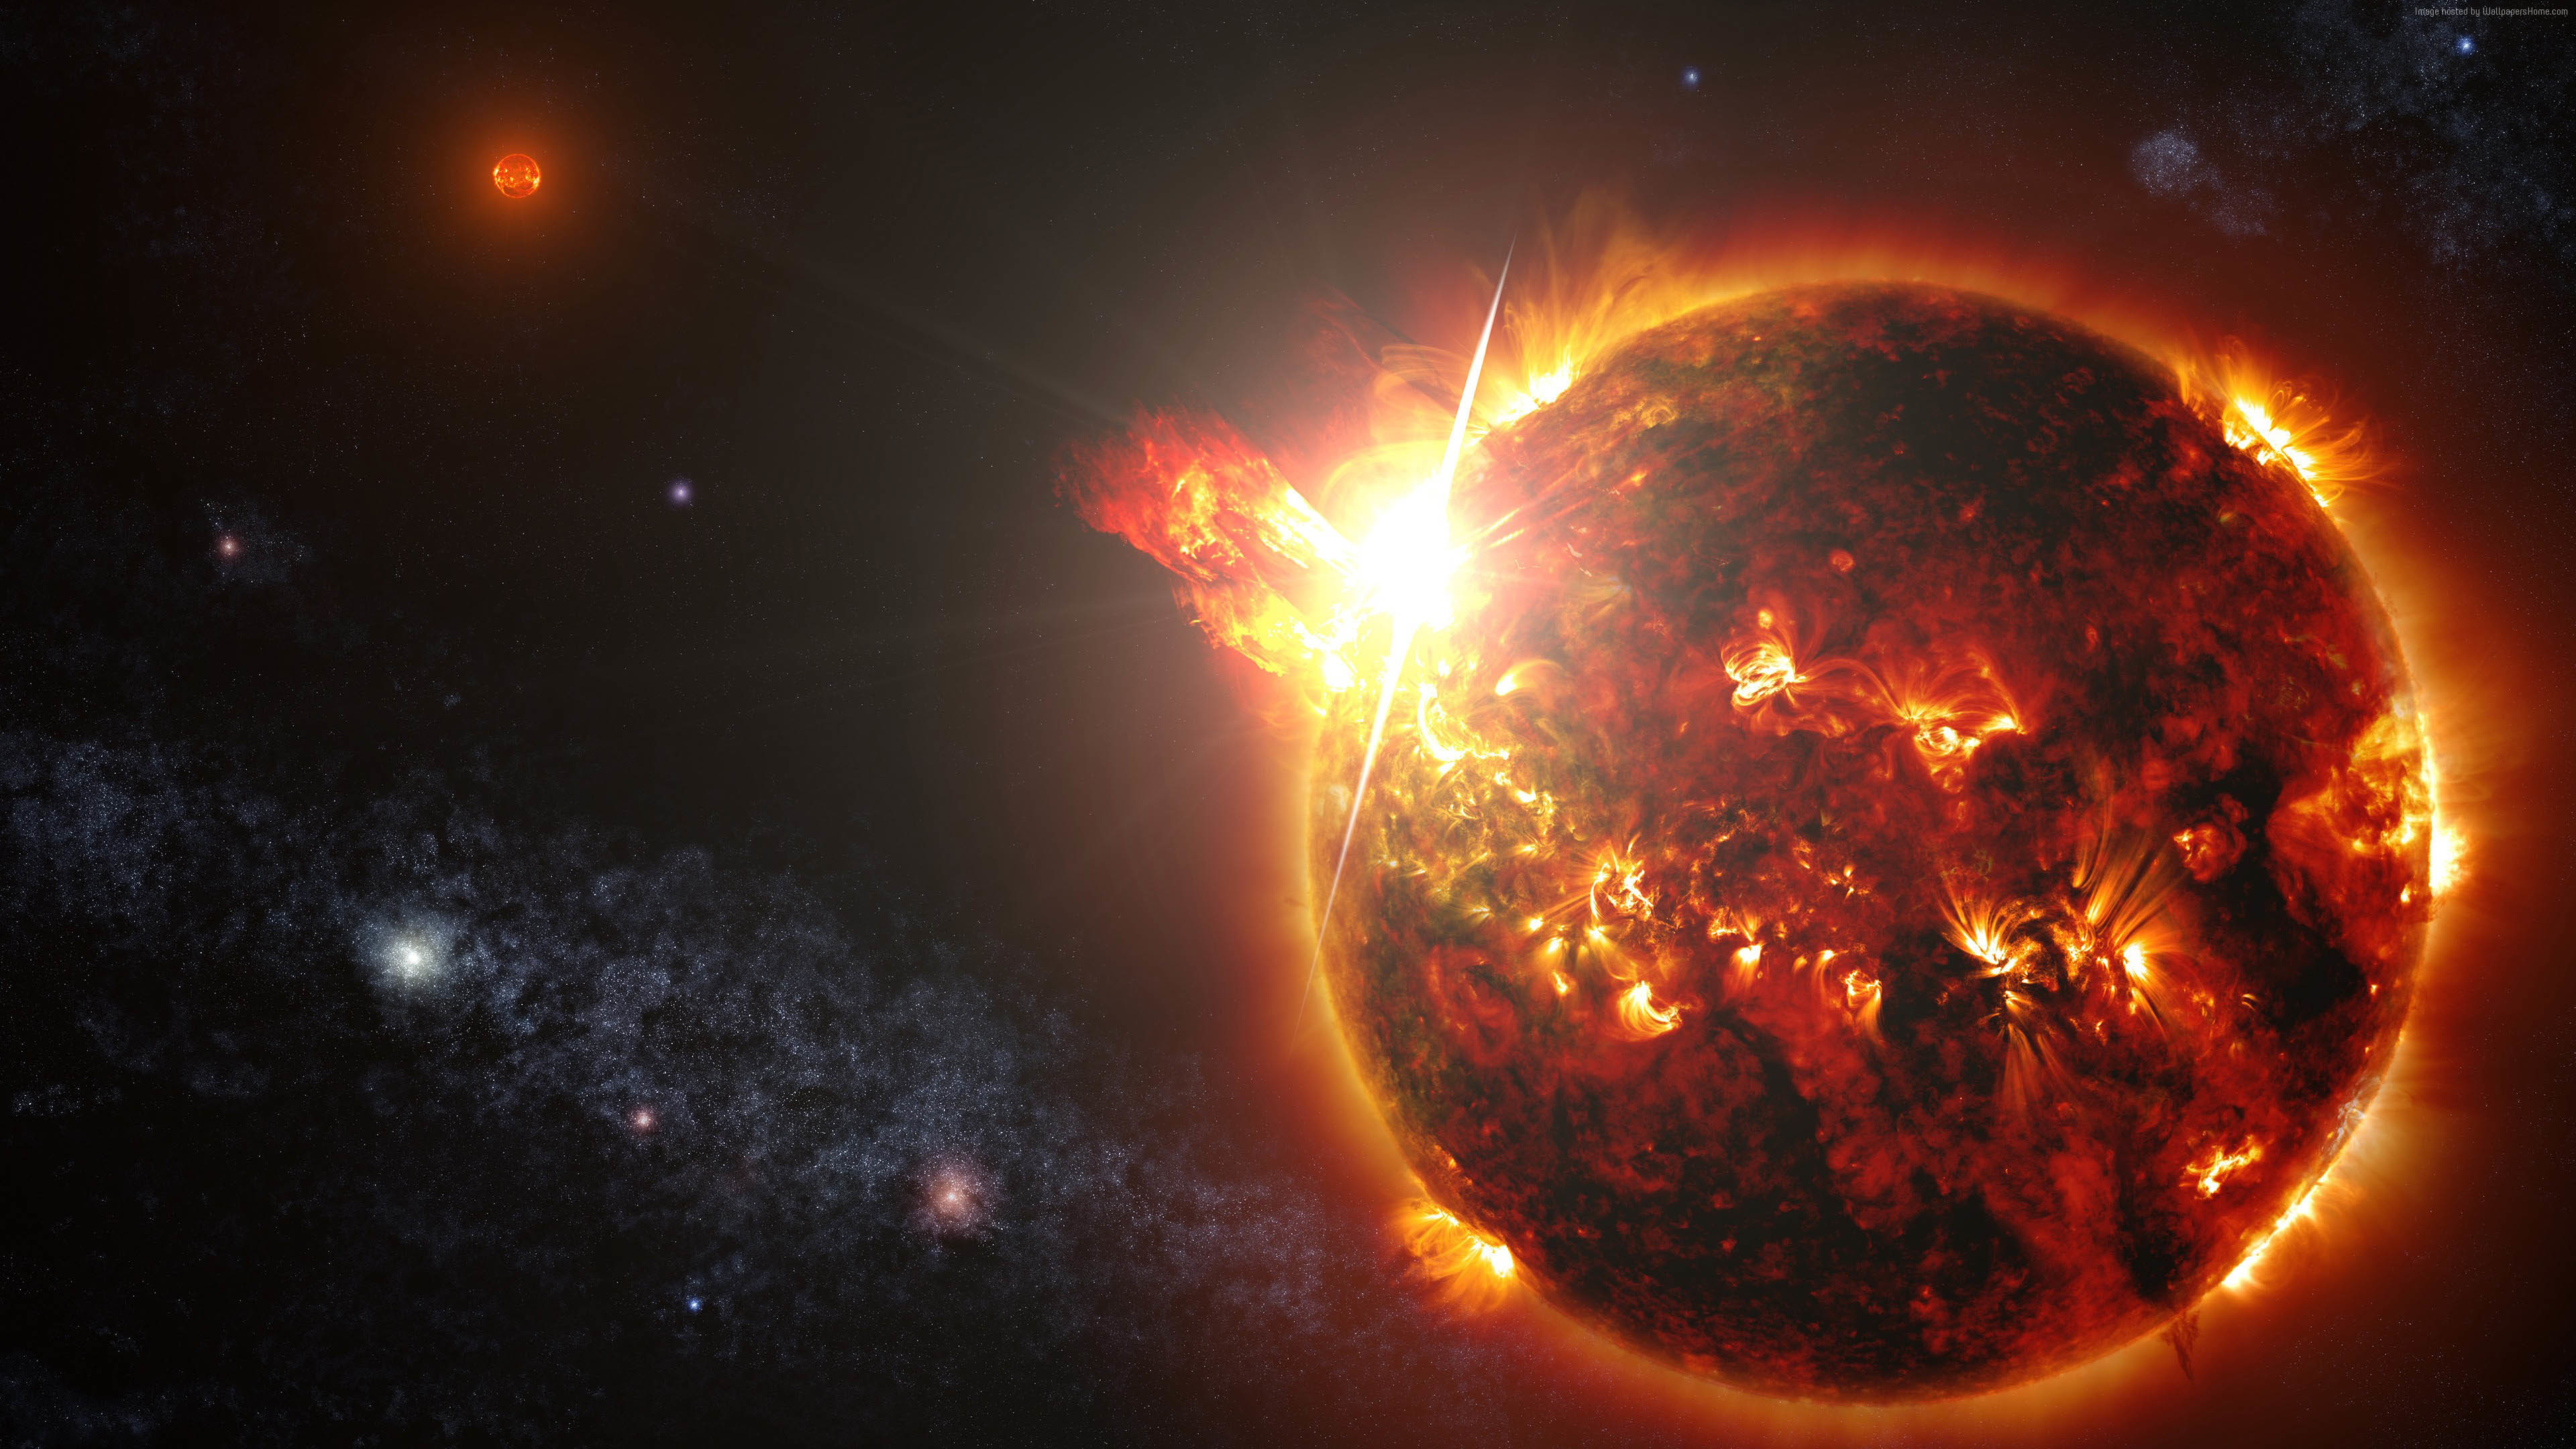 Erupting Planet Space Art Wallpaper wallpaper